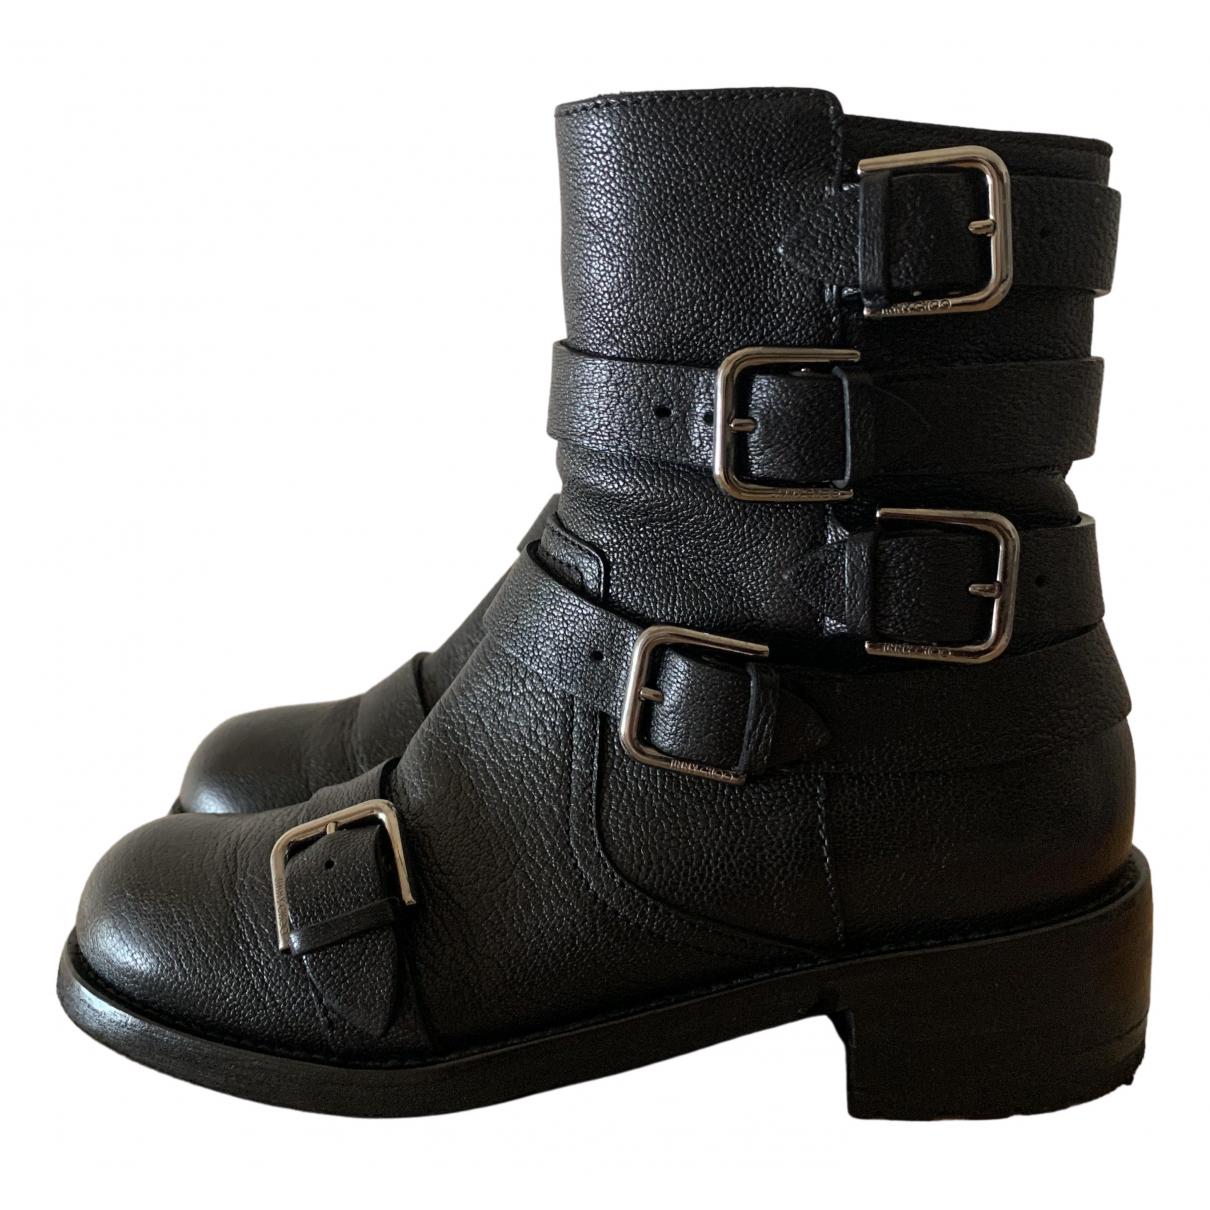 Jimmy Choo Hank flat Black Leather Ankle boots for Women 35 EU